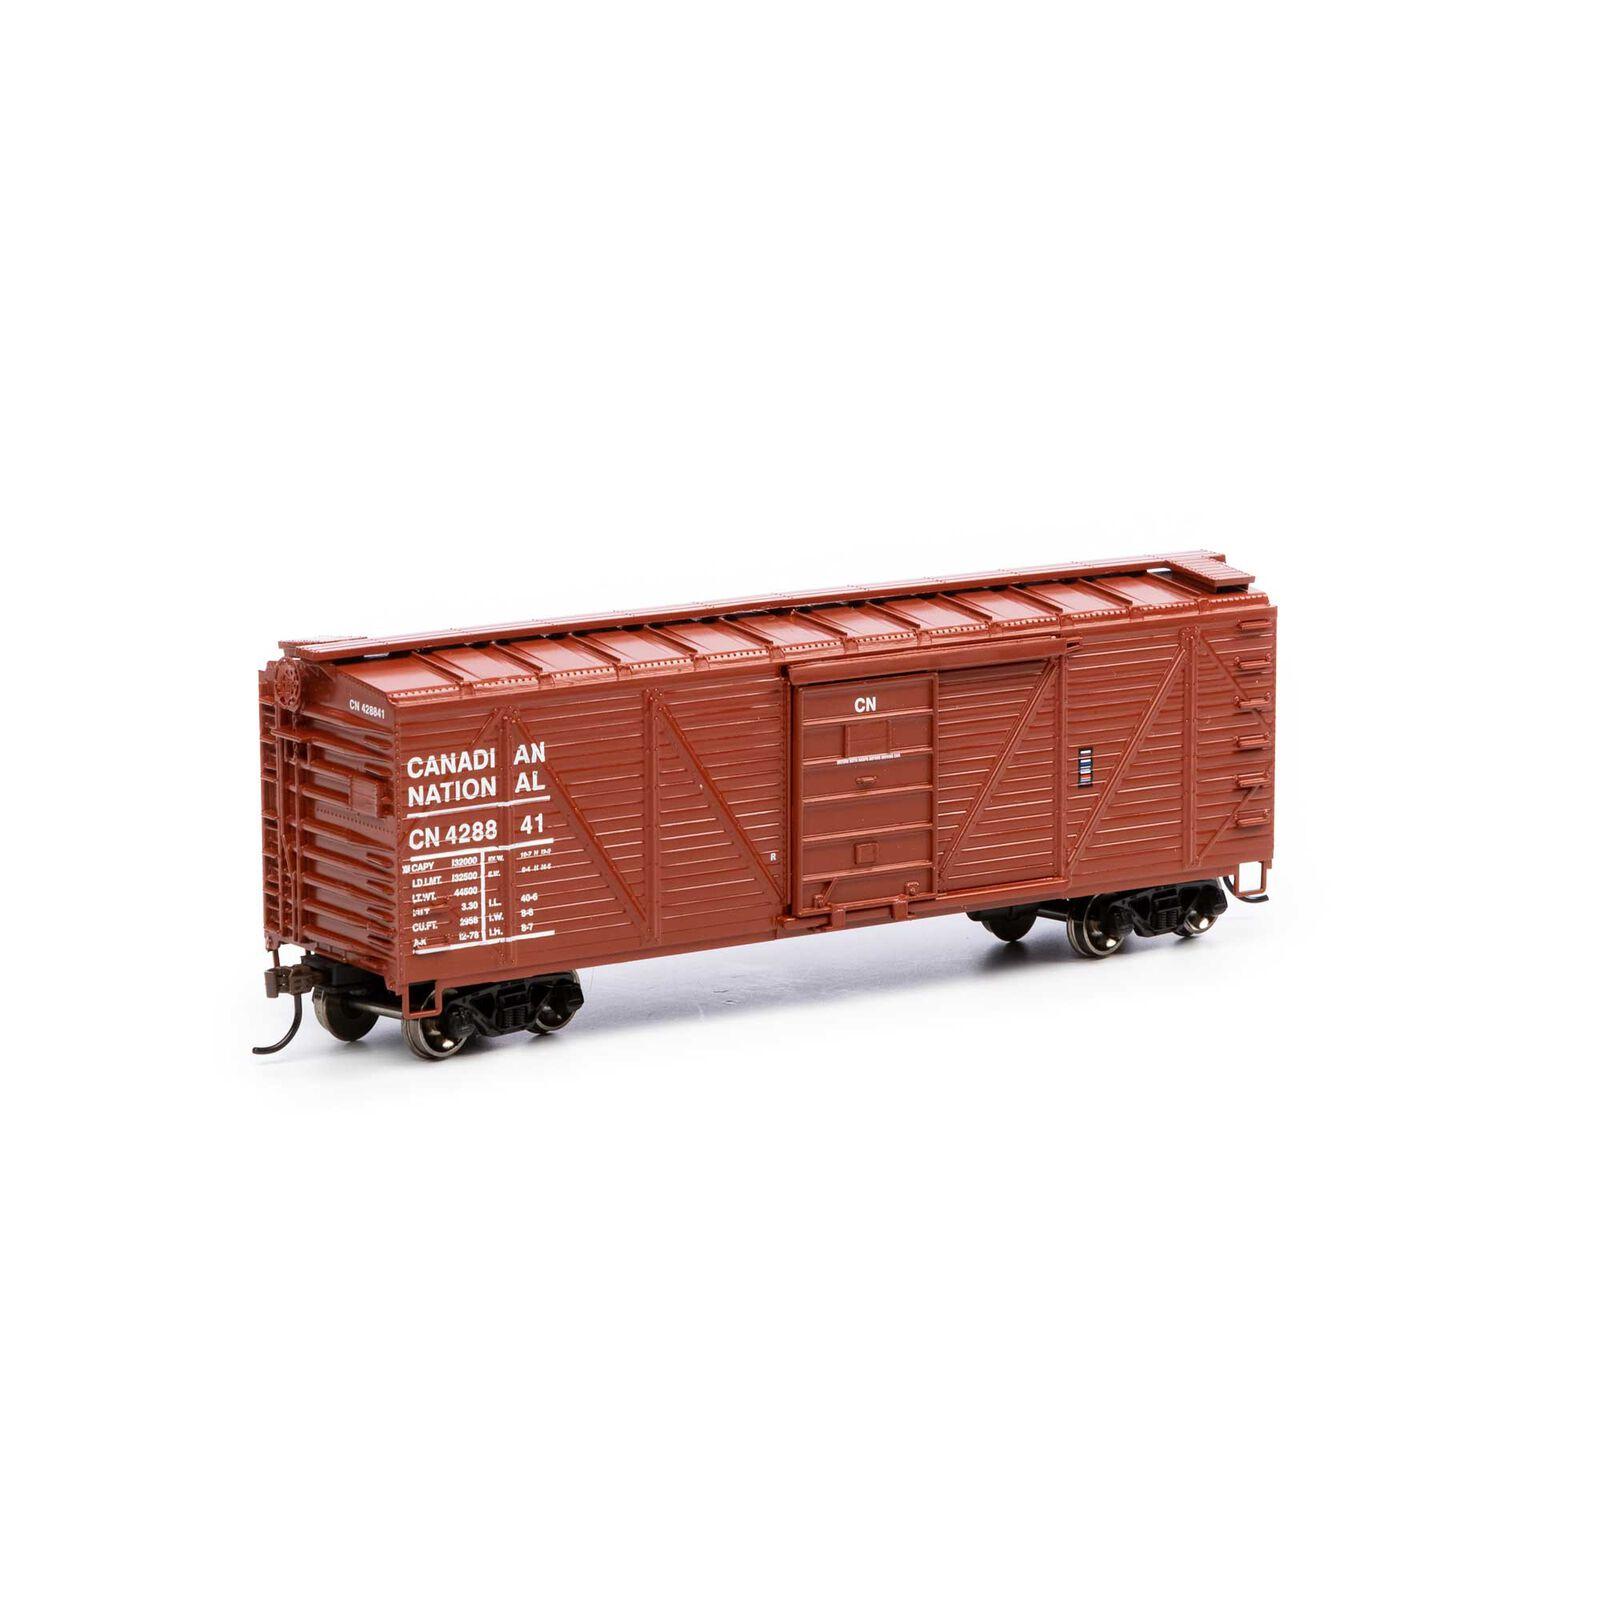 HO 40' Ribbed Wooden Box CN #428841